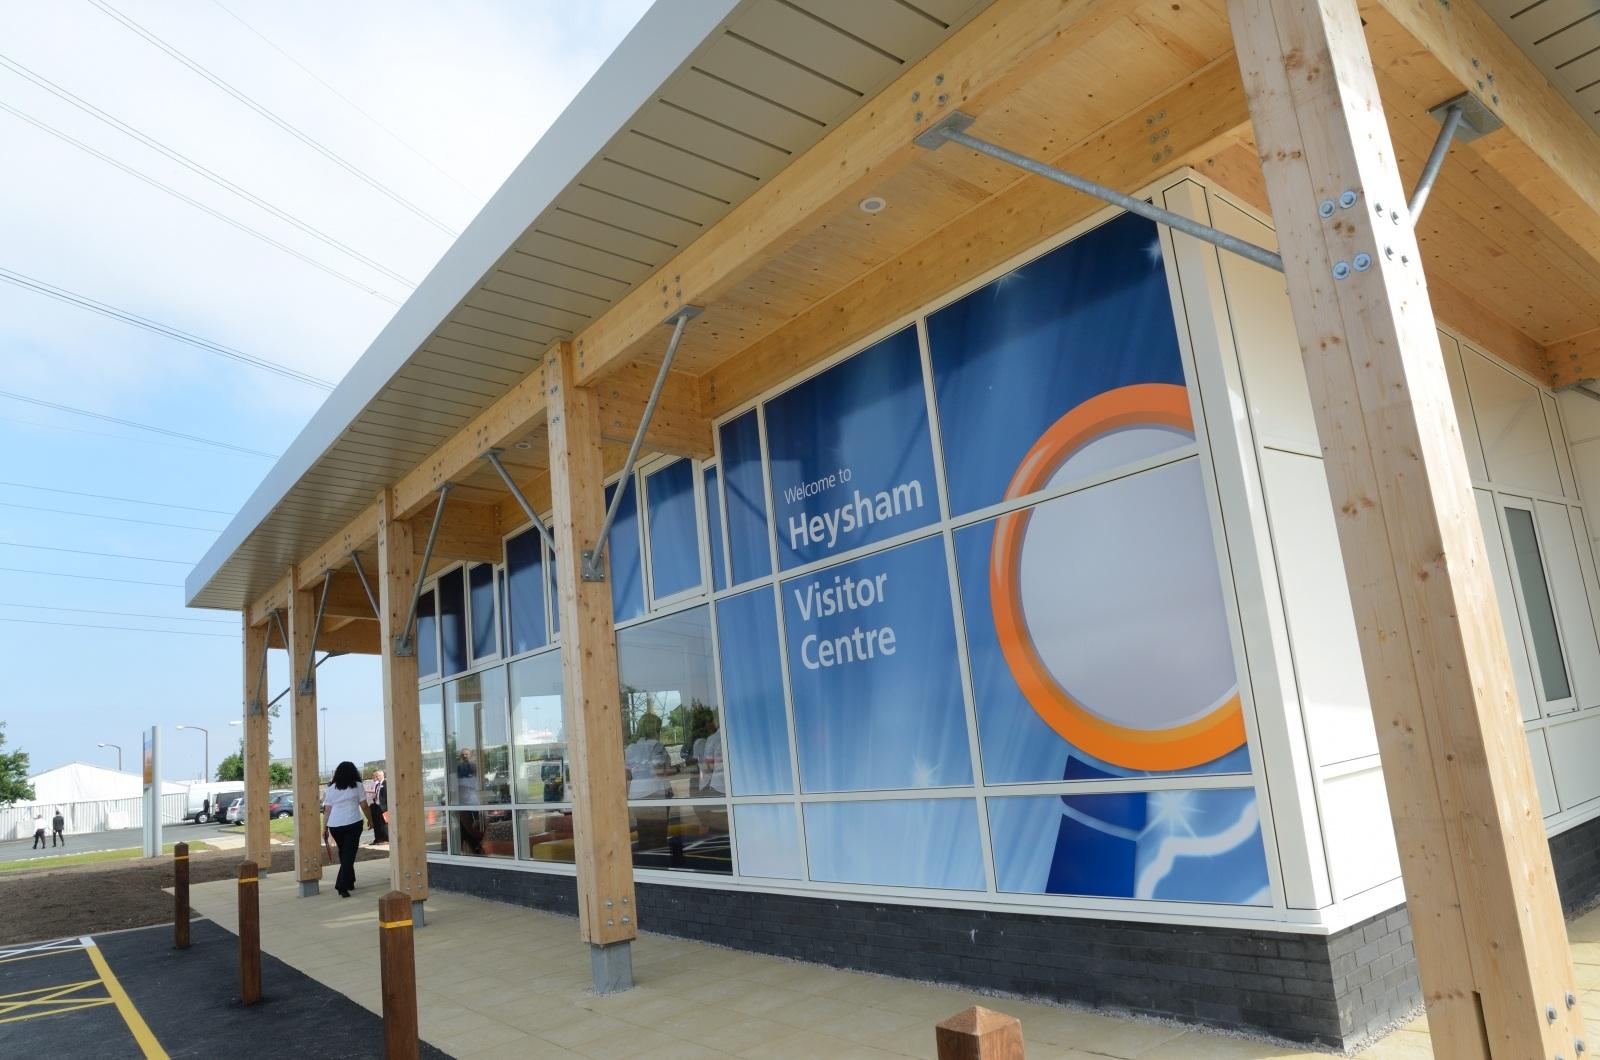 Heysham visitor centre